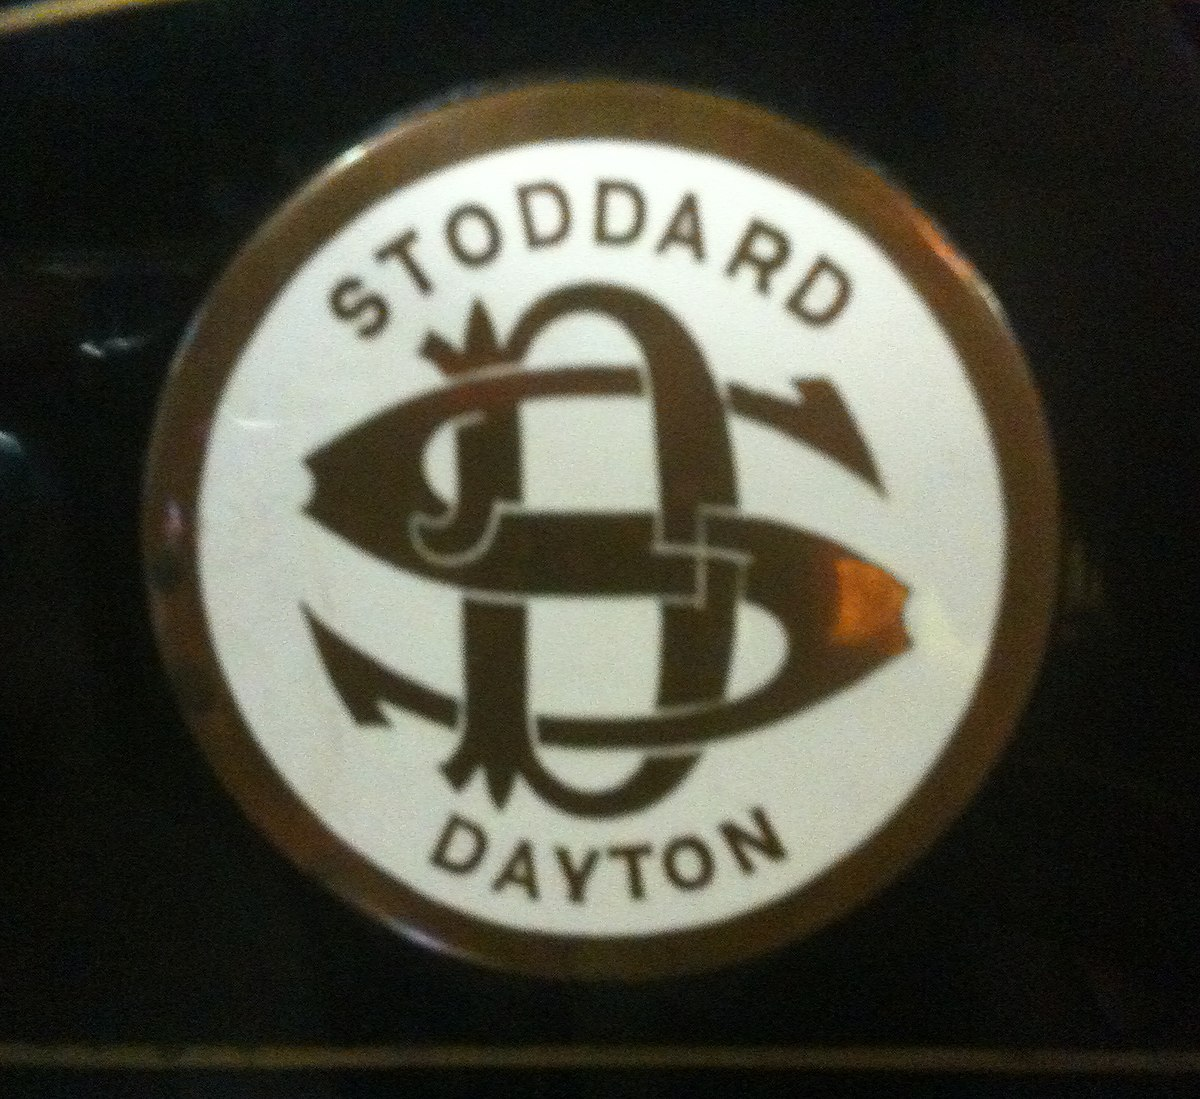 Cars In Ohio >> Stoddard-Dayton - Wikipedia